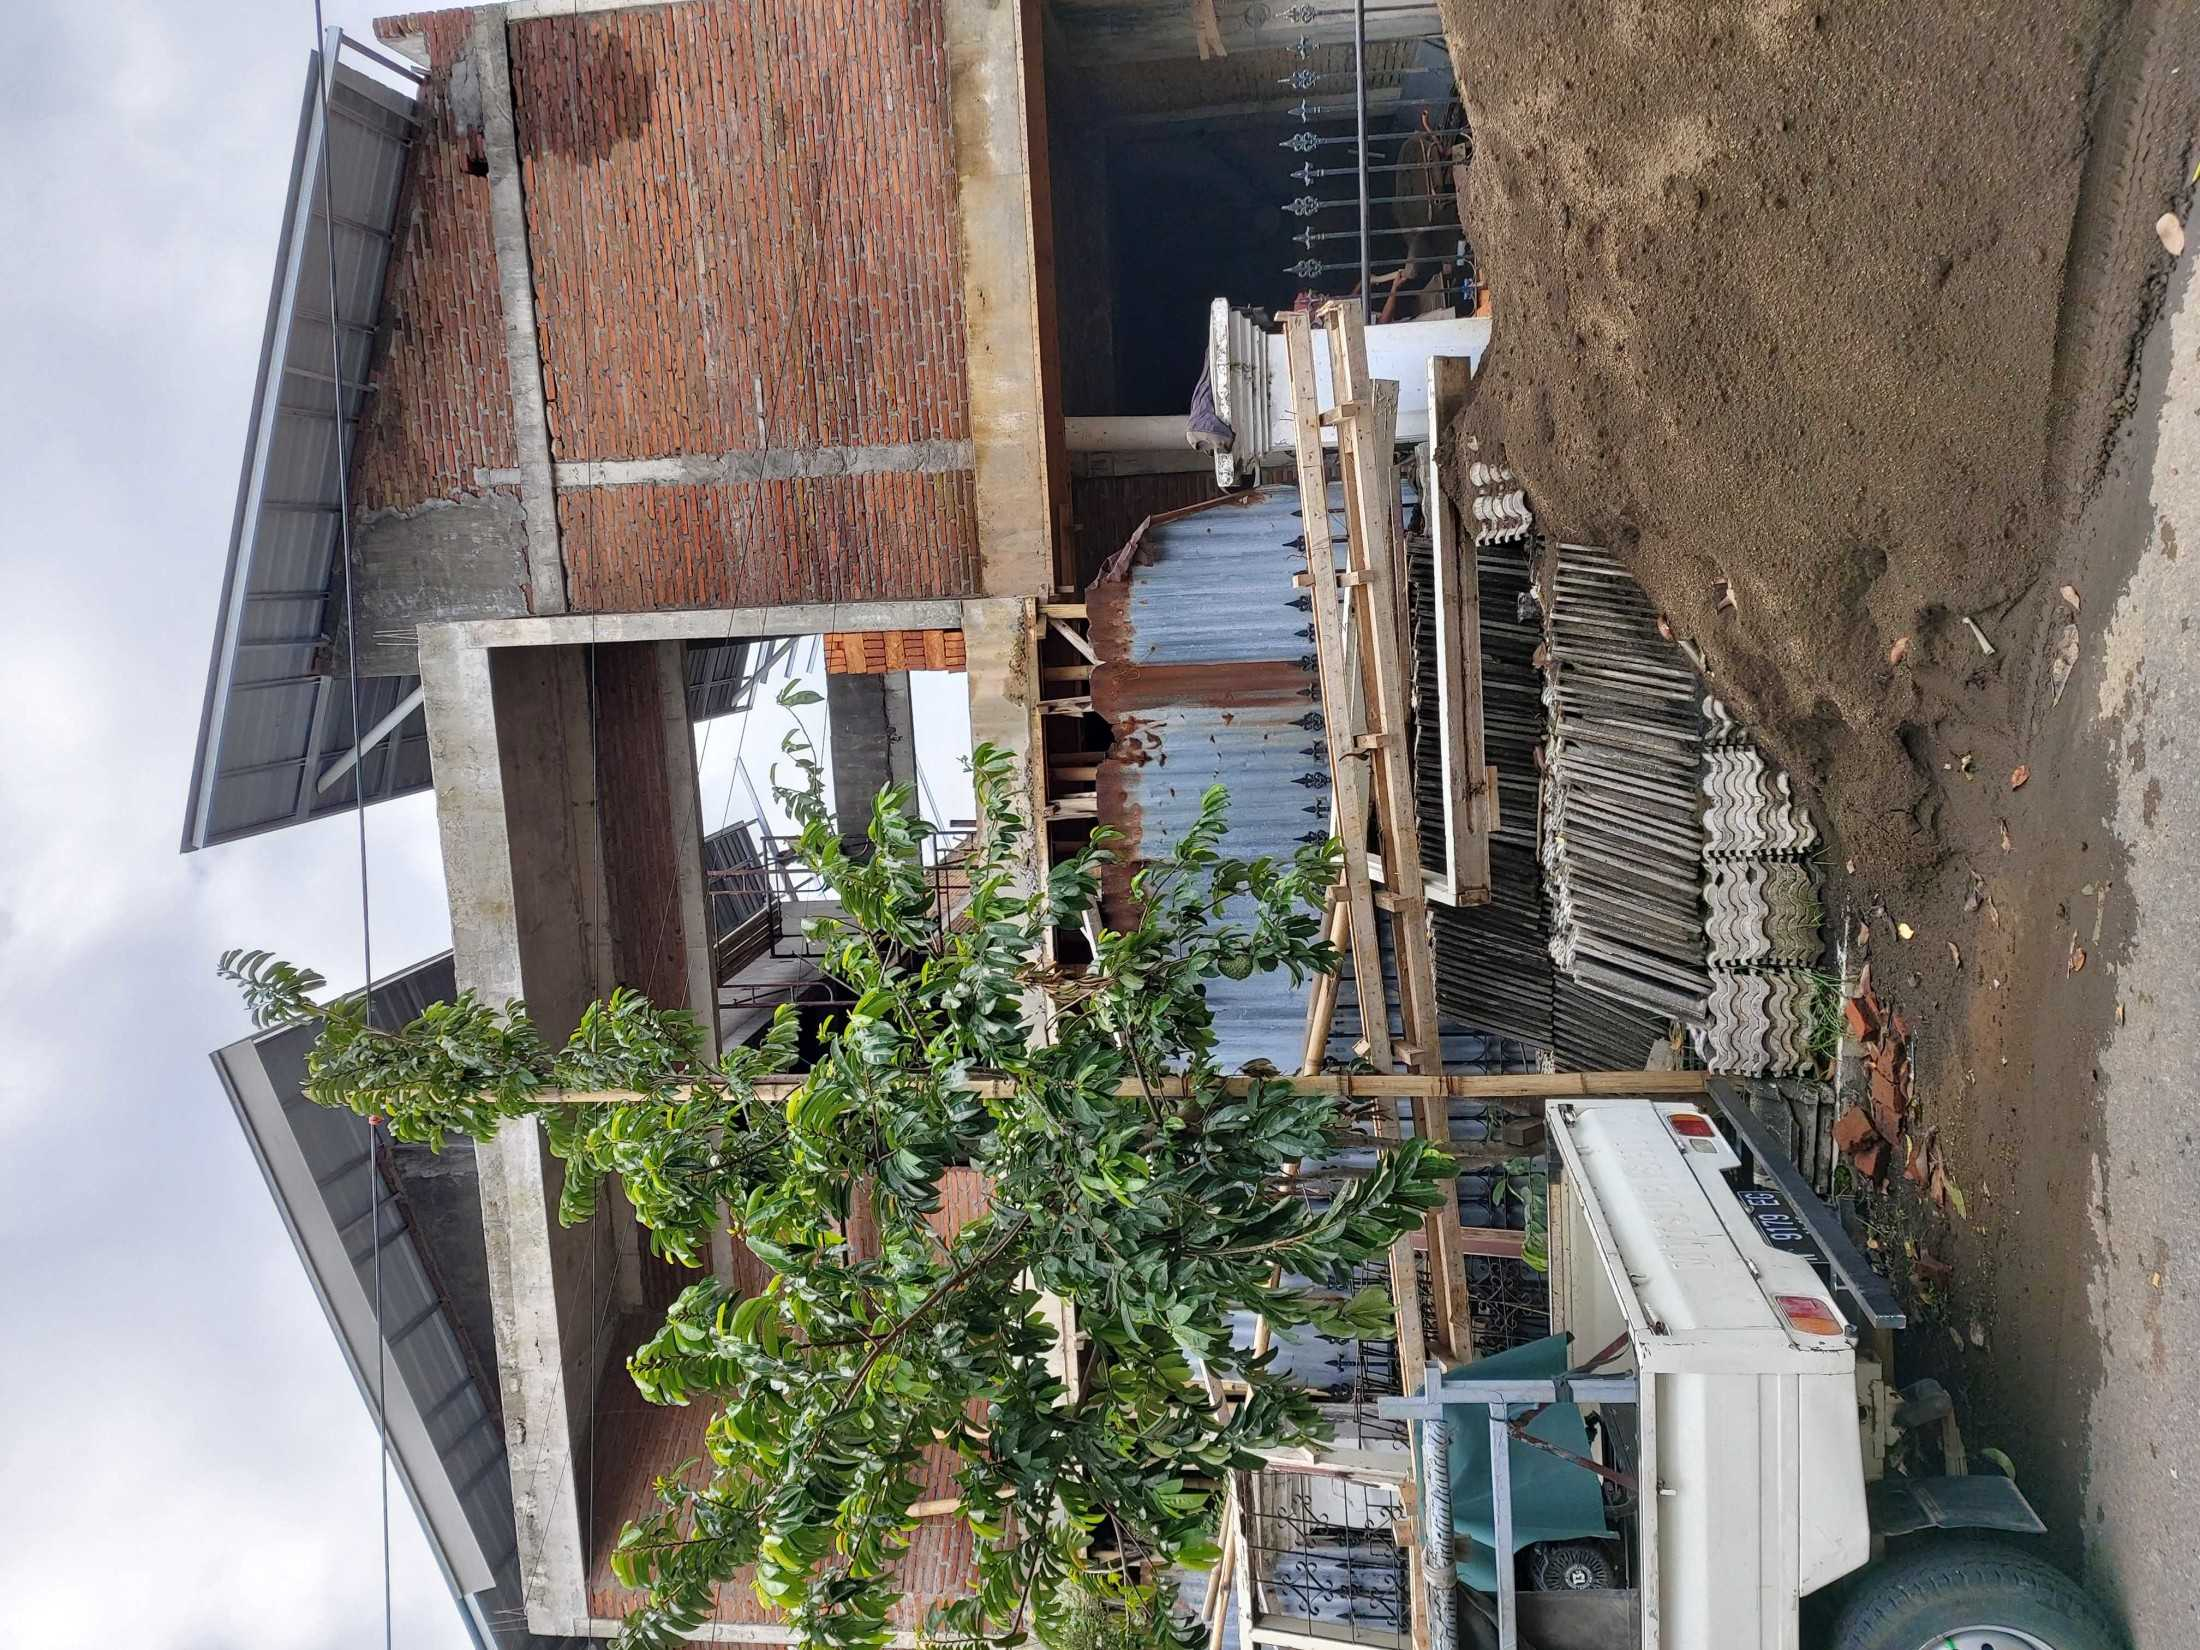 Flav Arsitek Mrs.yuli Boarding House Malang, Kota Malang, Jawa Timur, Indonesia Malang, Kota Malang, Jawa Timur, Indonesia Flav-Arsitek-Mrsyuli-Boarding-House  113856